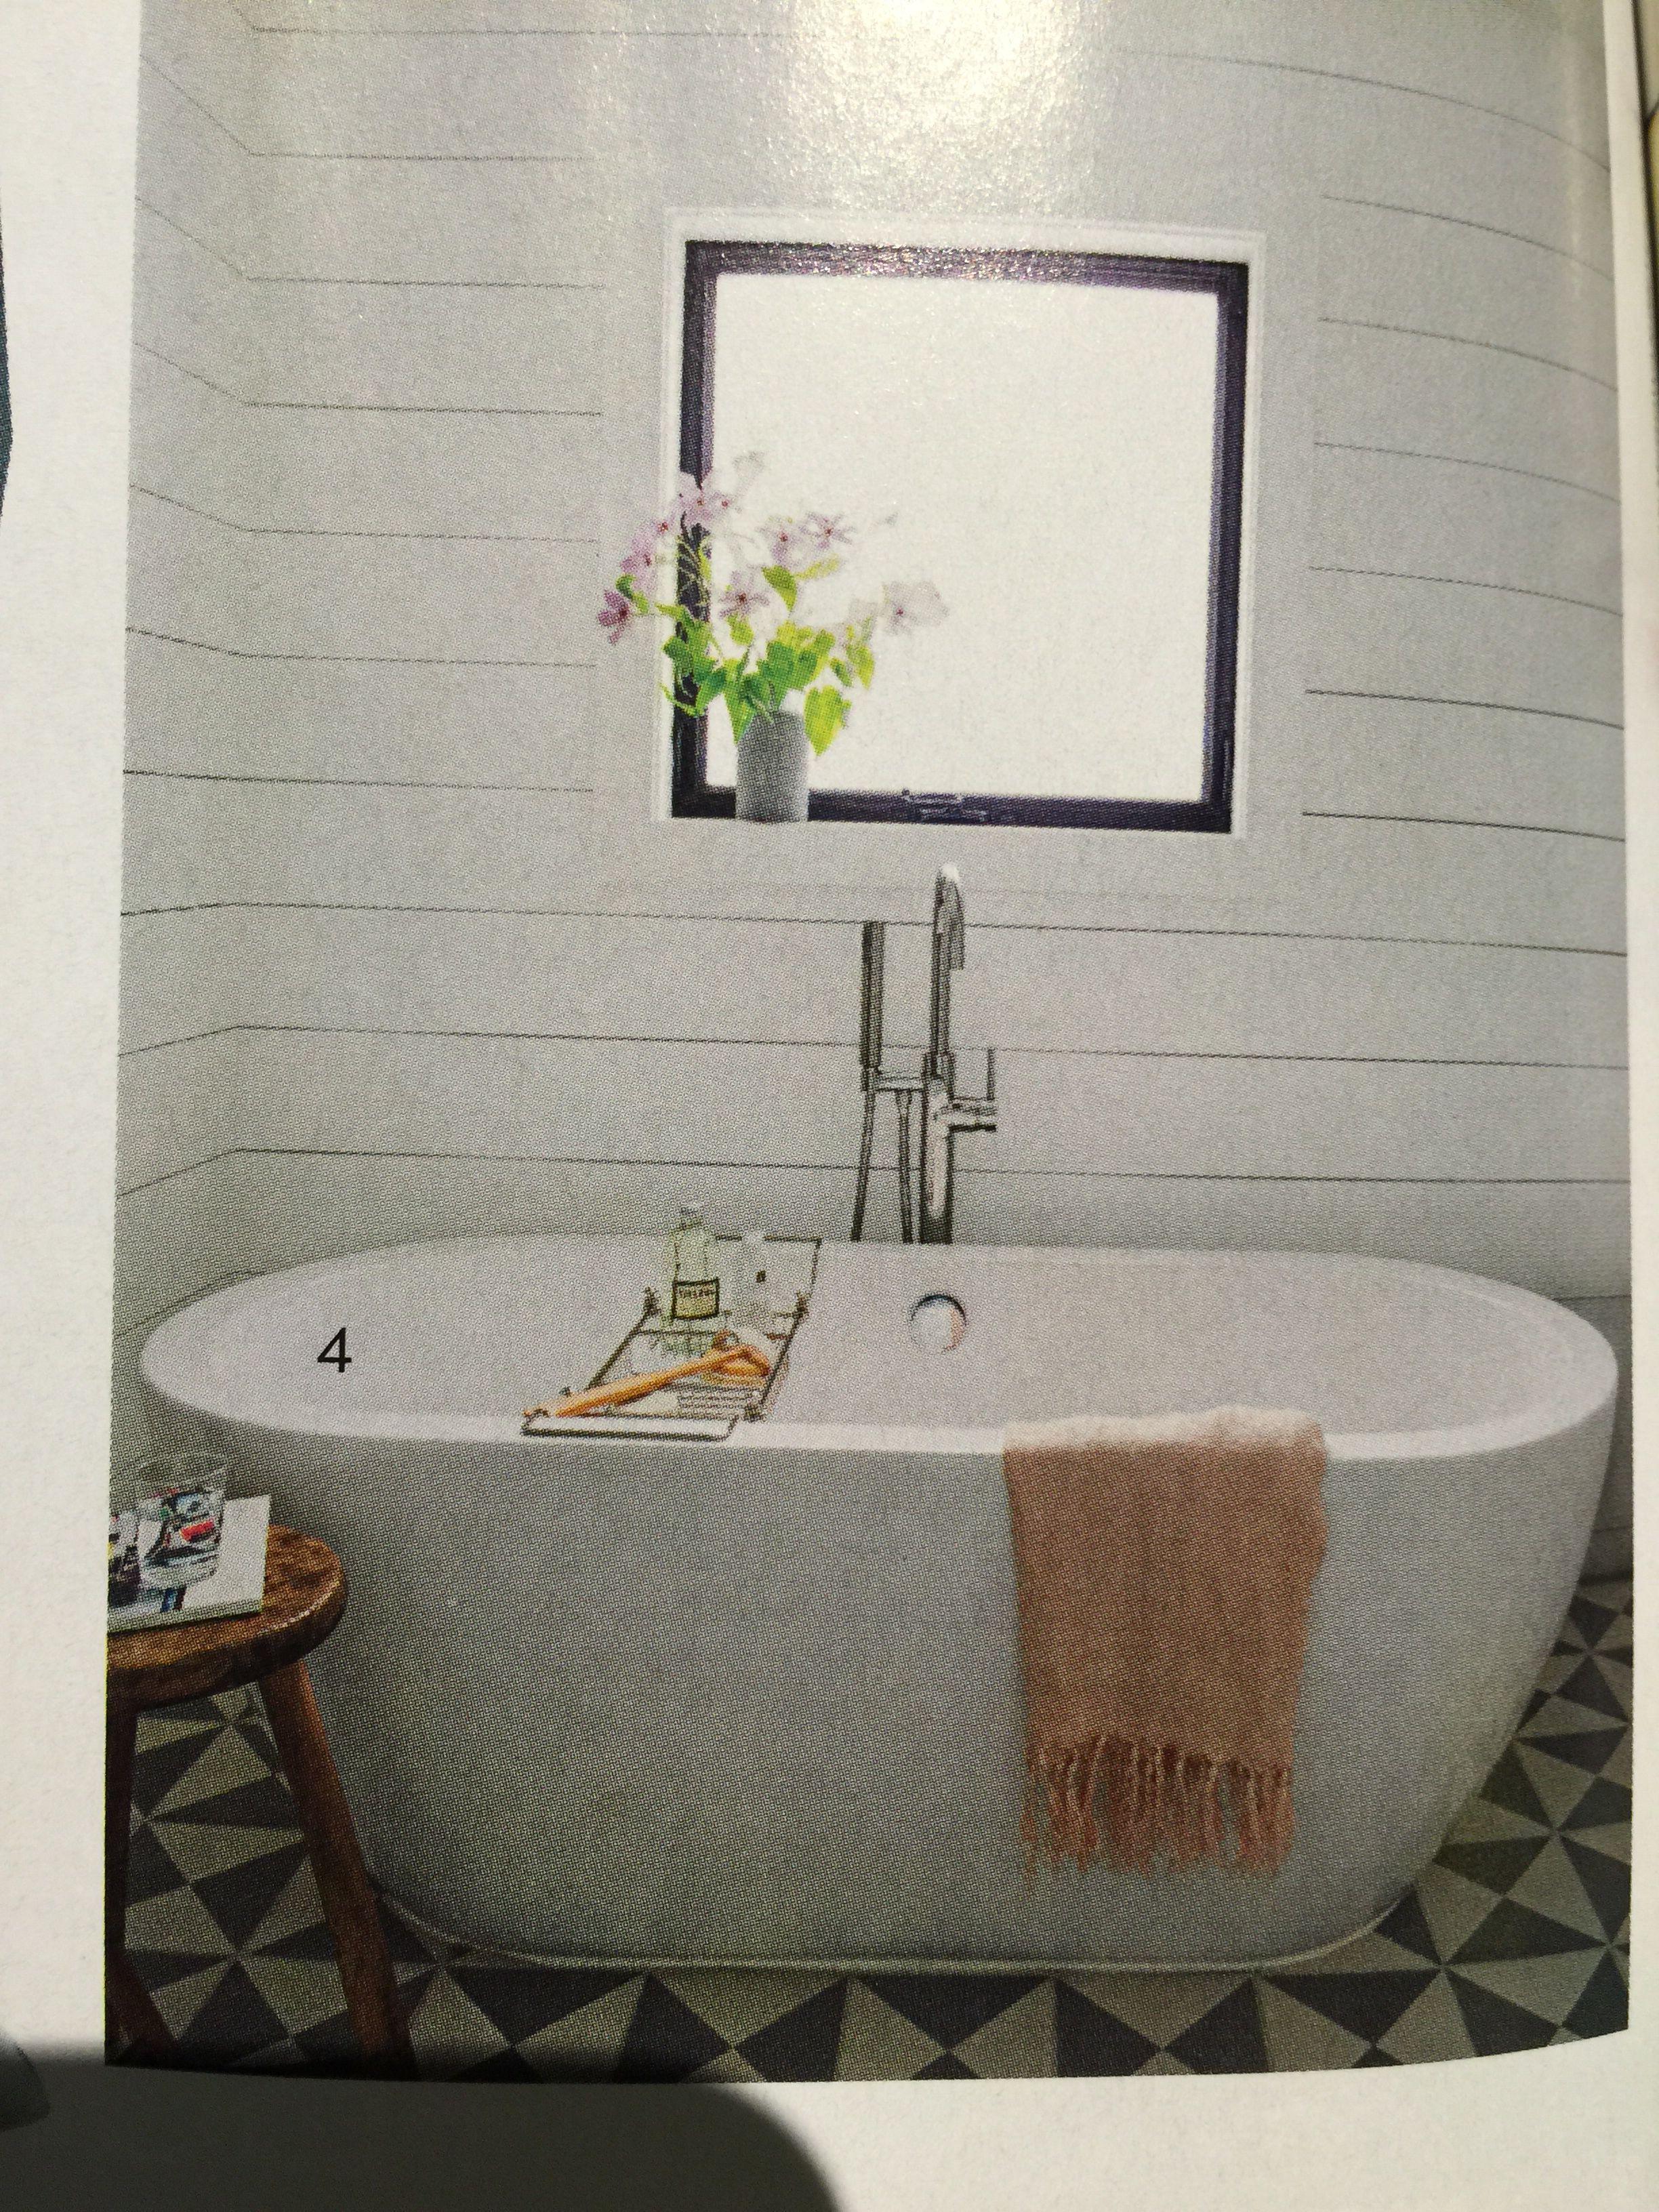 rachel shipping today free bathtub inch ove overstock garden bathtubs freestanding product decors wyndham home